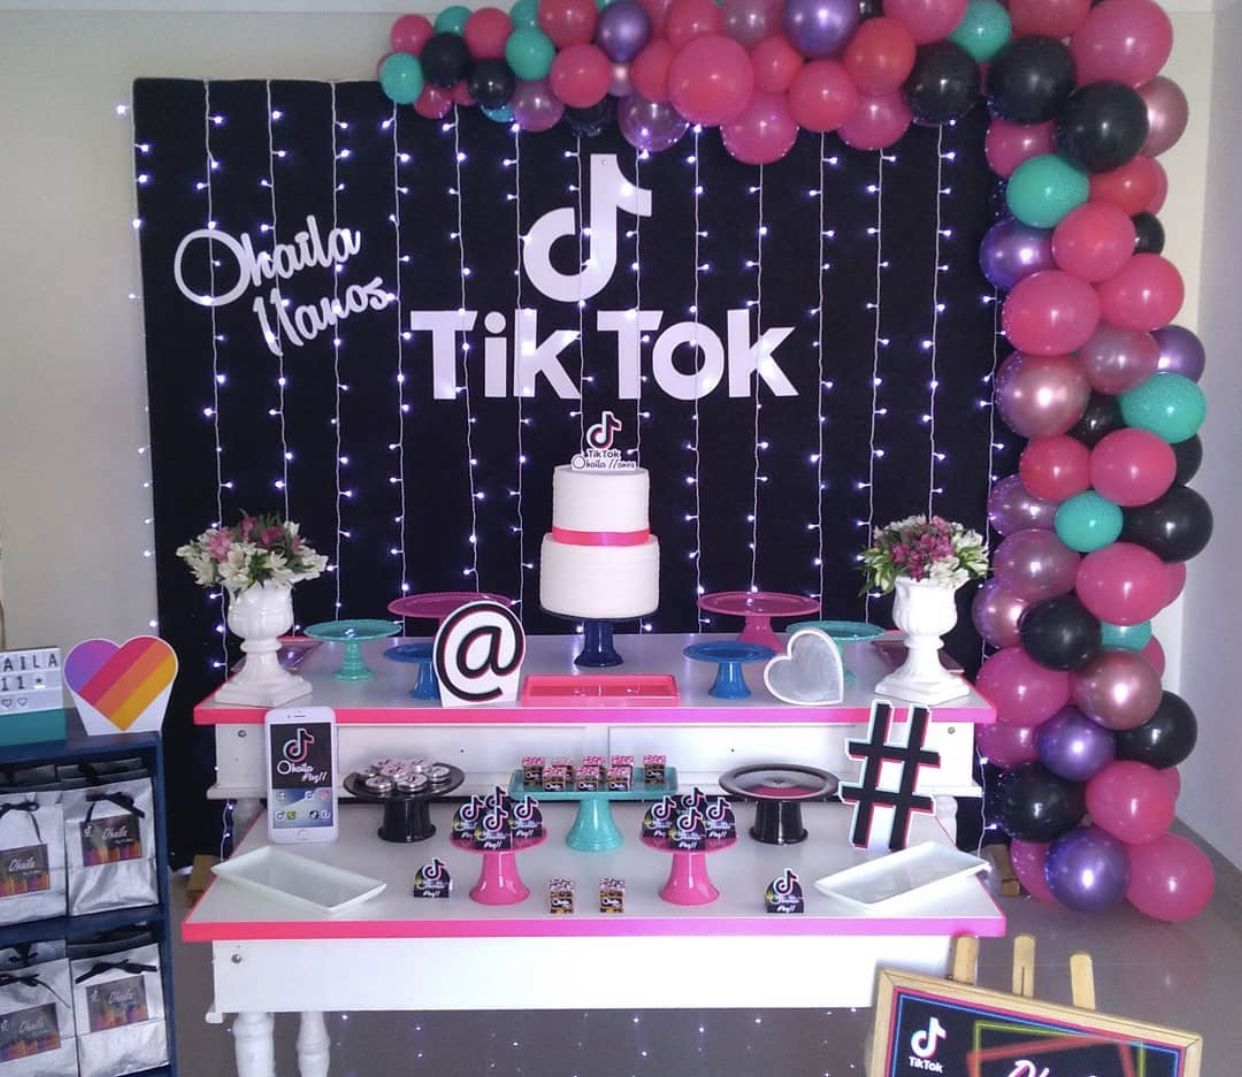 Pin By Joan Hagedorn On Tiktok Birthday Party Birthday Surprise Party Birthday Party Images Birthday Parties